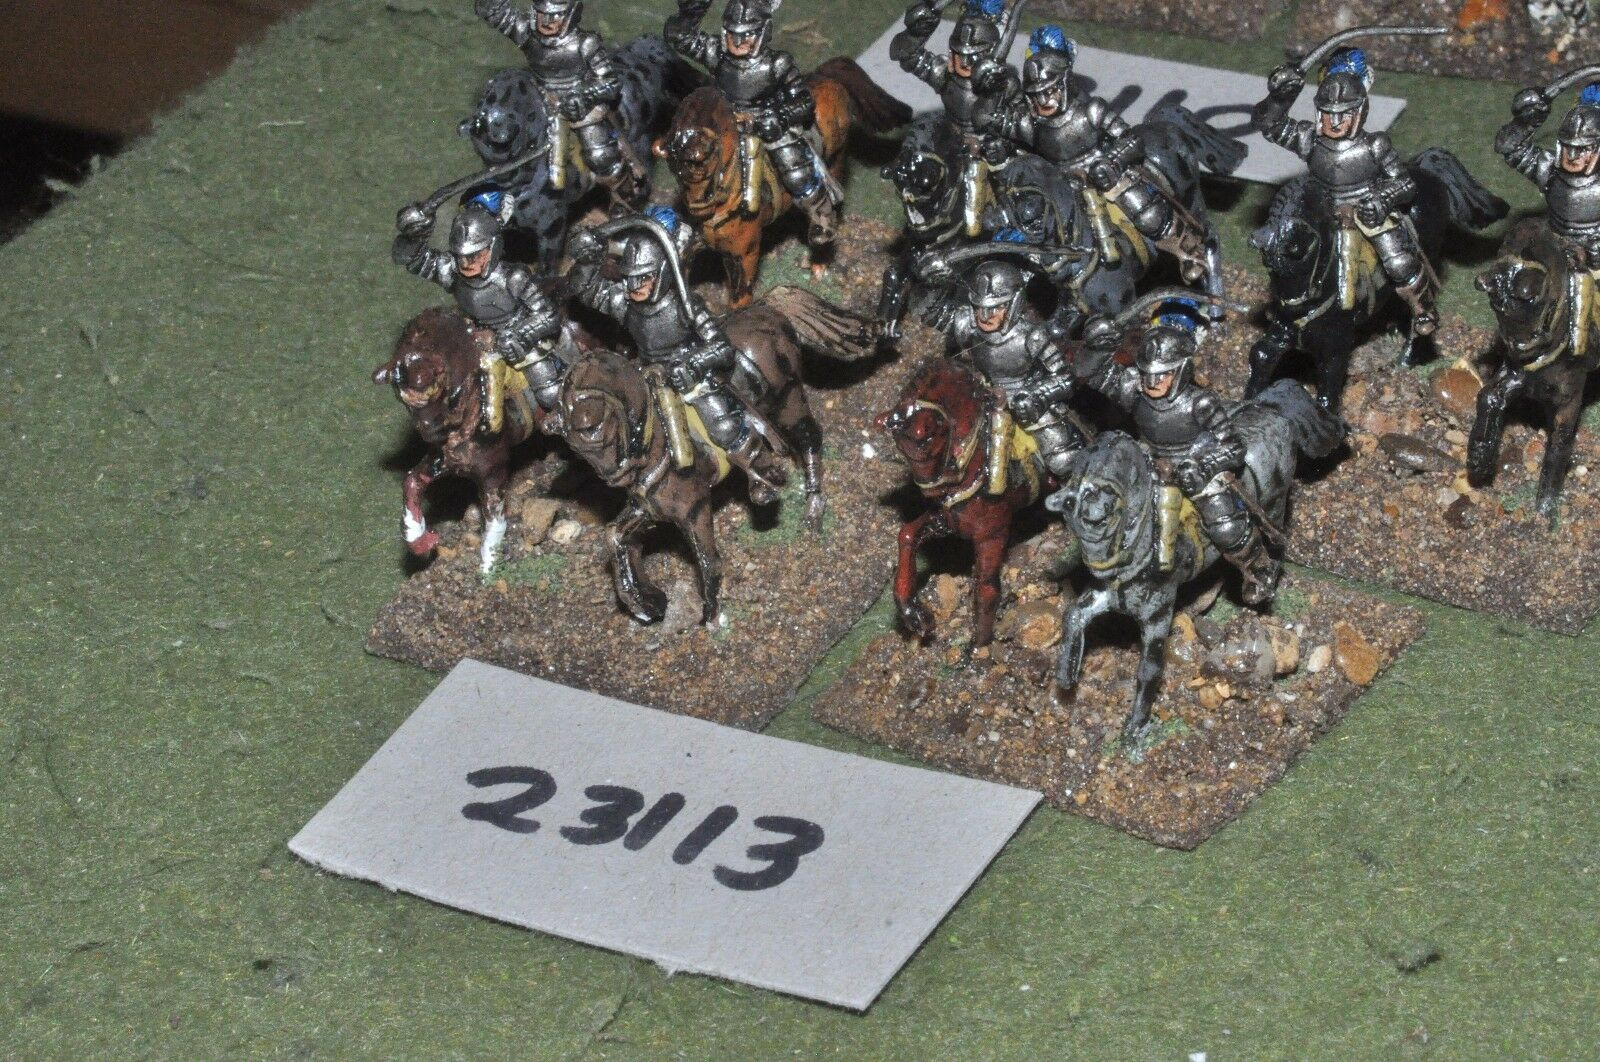 25mm ECW   parliament - cuirassiers 10 figures - cav (23113)